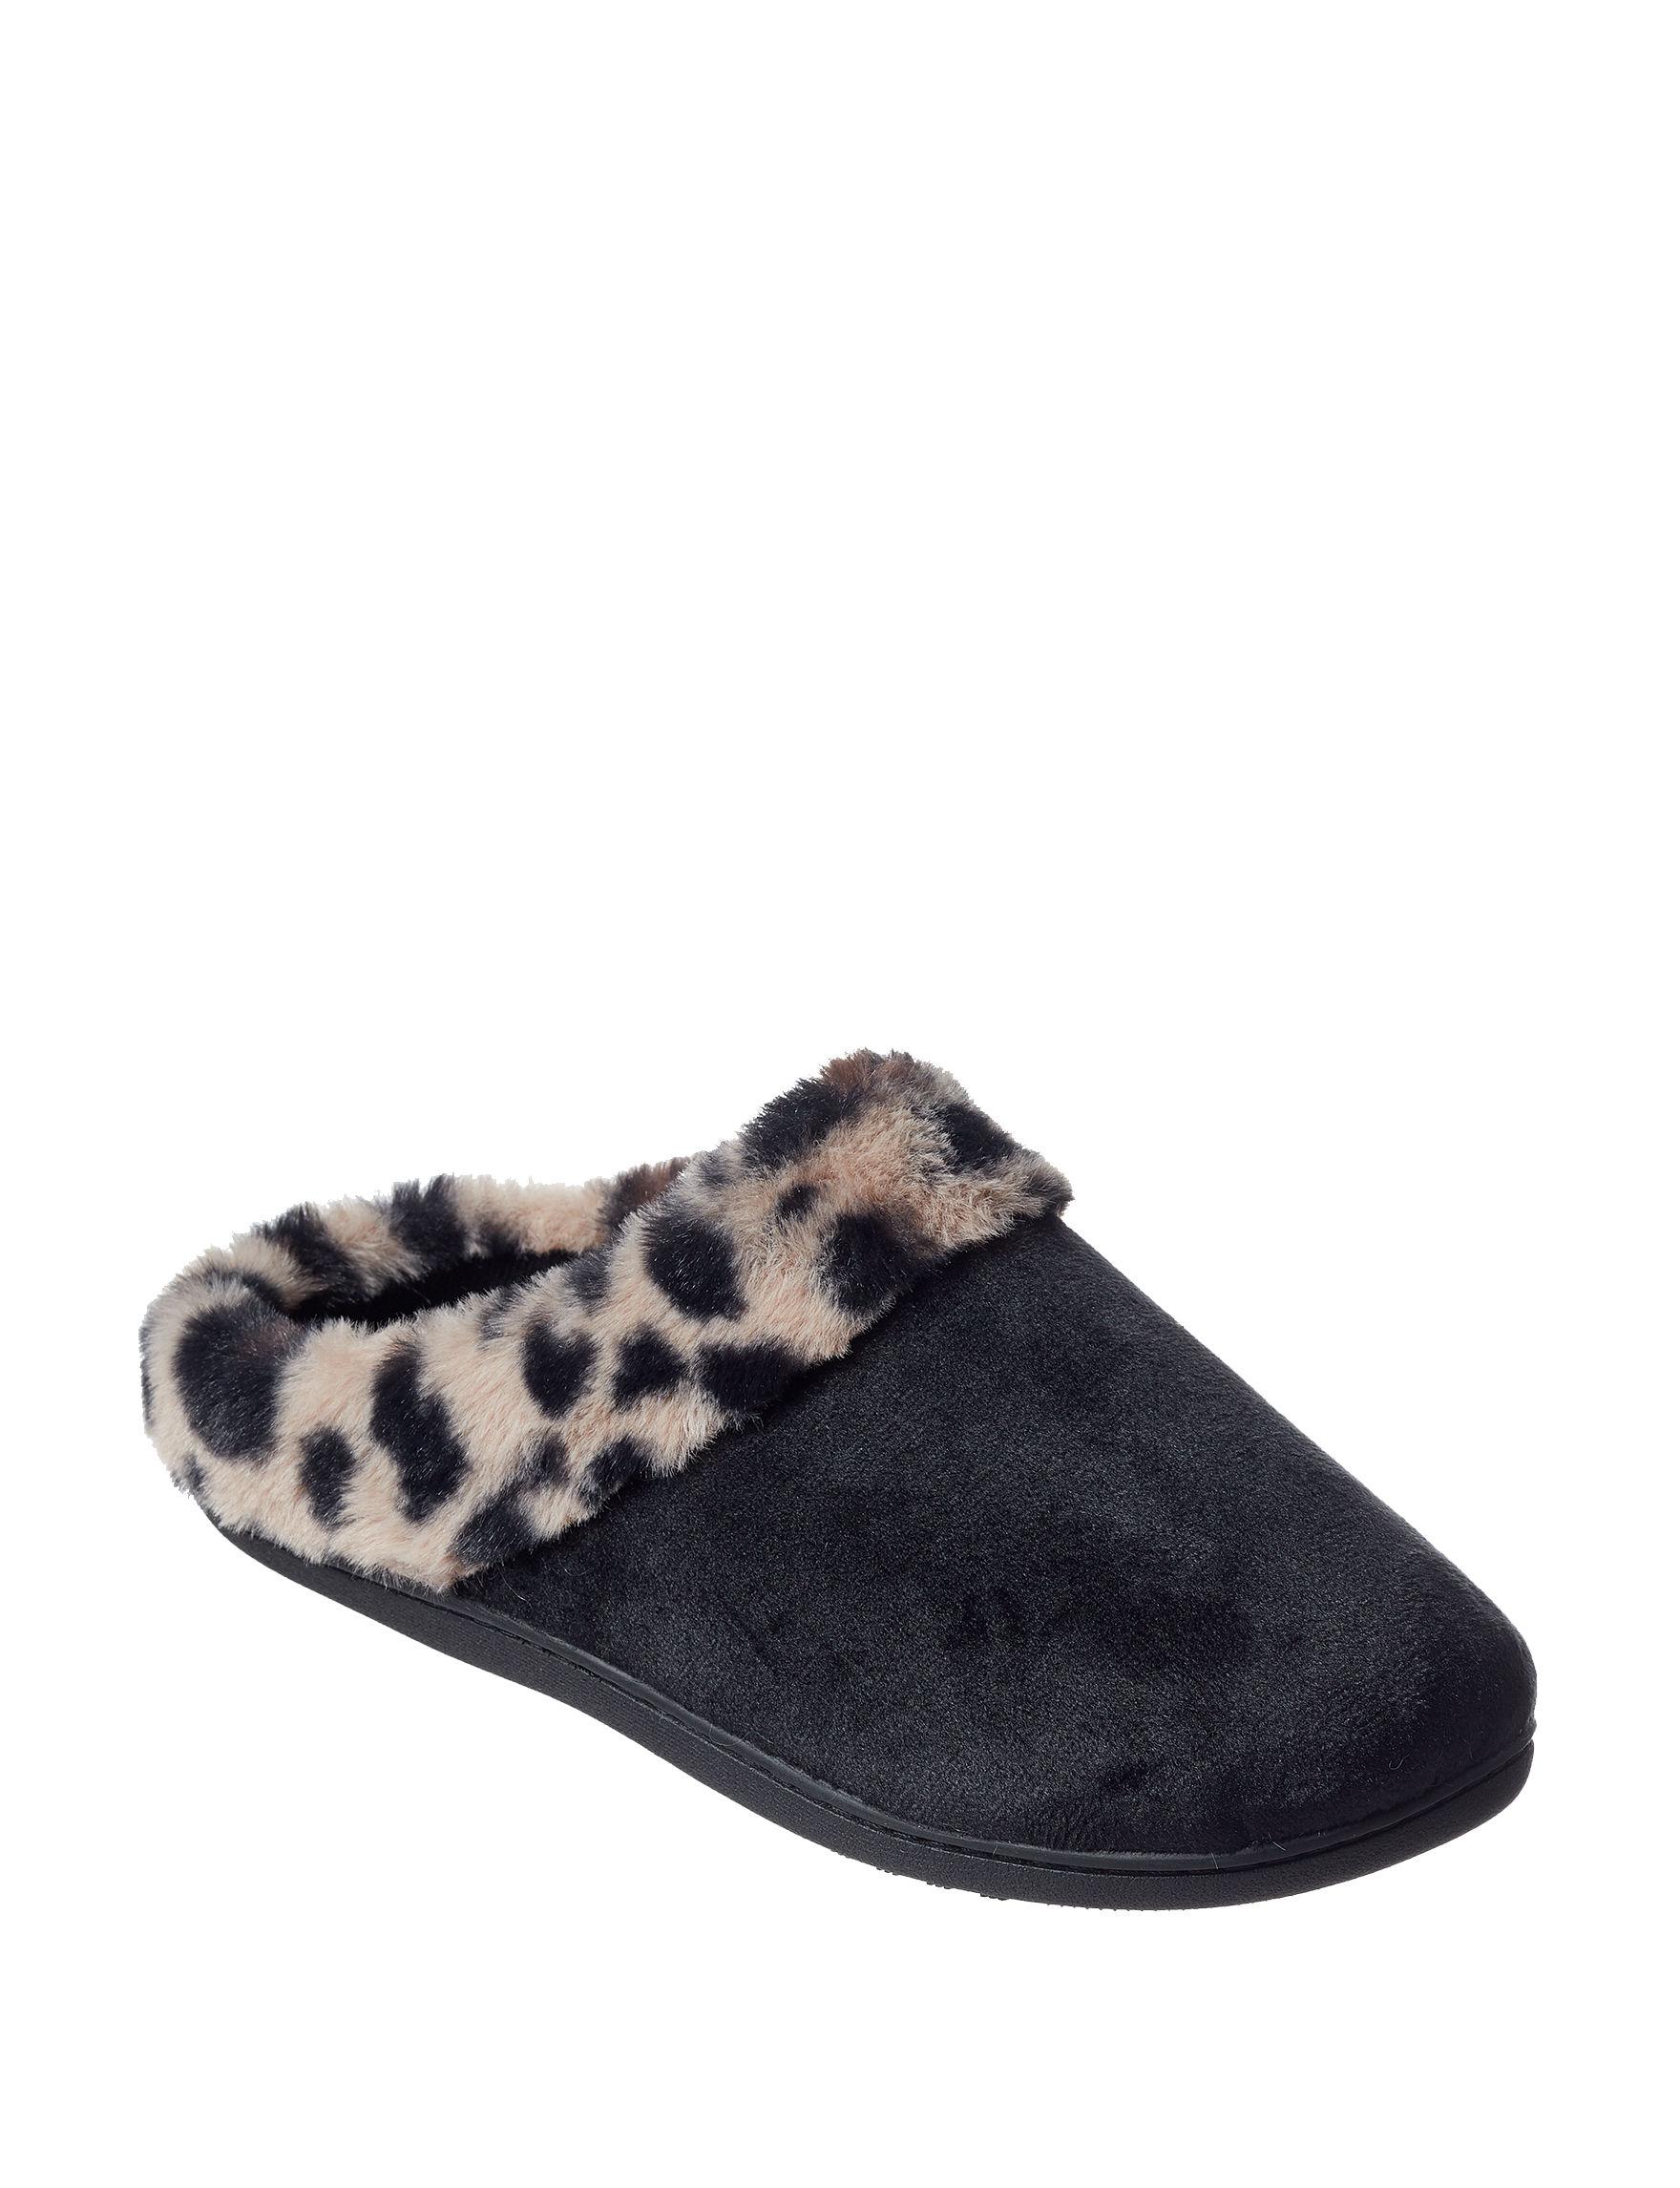 Isotoner Black Slipper Shoes